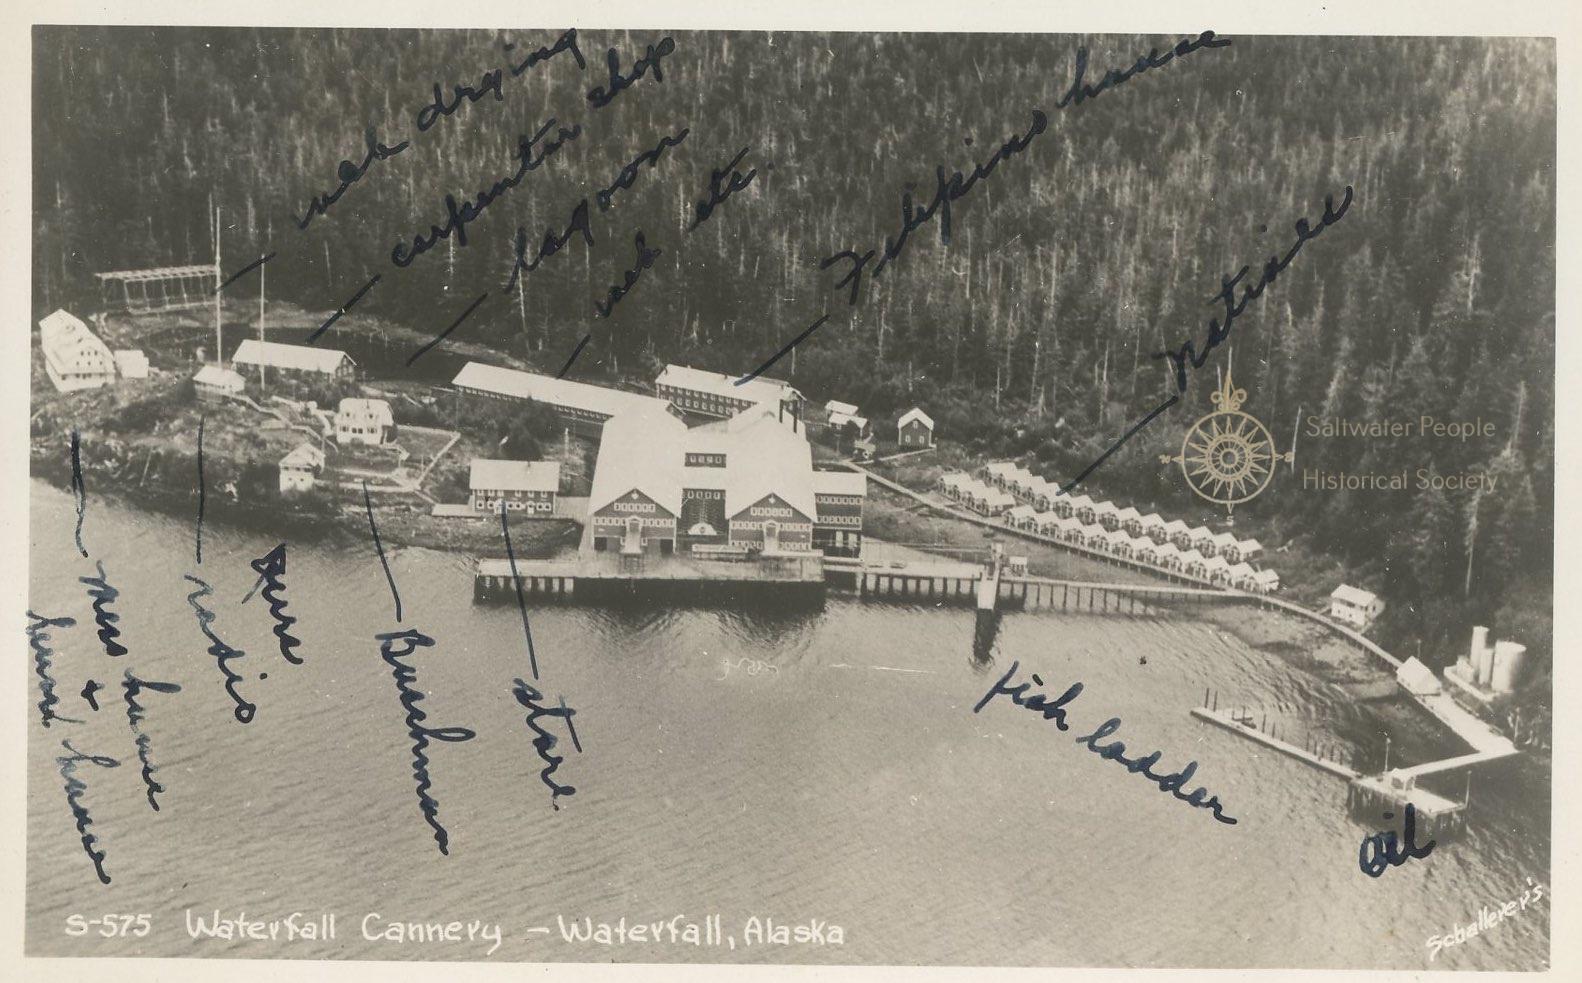 Saltwater People Log: ❖ WATERFALL CANNERY ❖ ALASKA